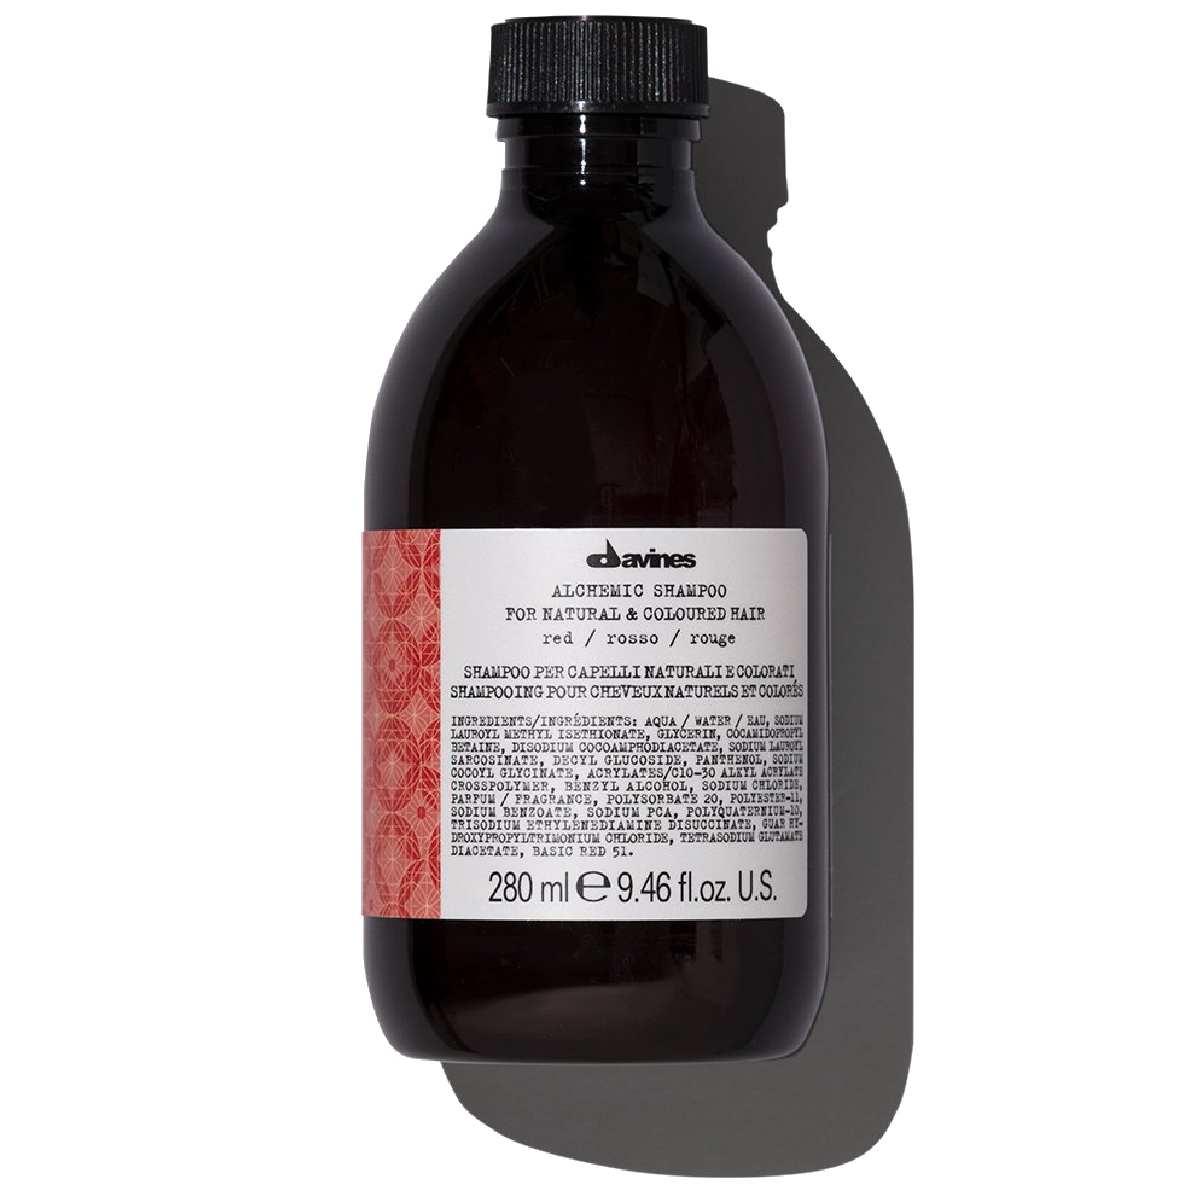 Davines Alchemic Шампунь (Красный), 280 мл davines alchemic шампунь золотой 280 мл